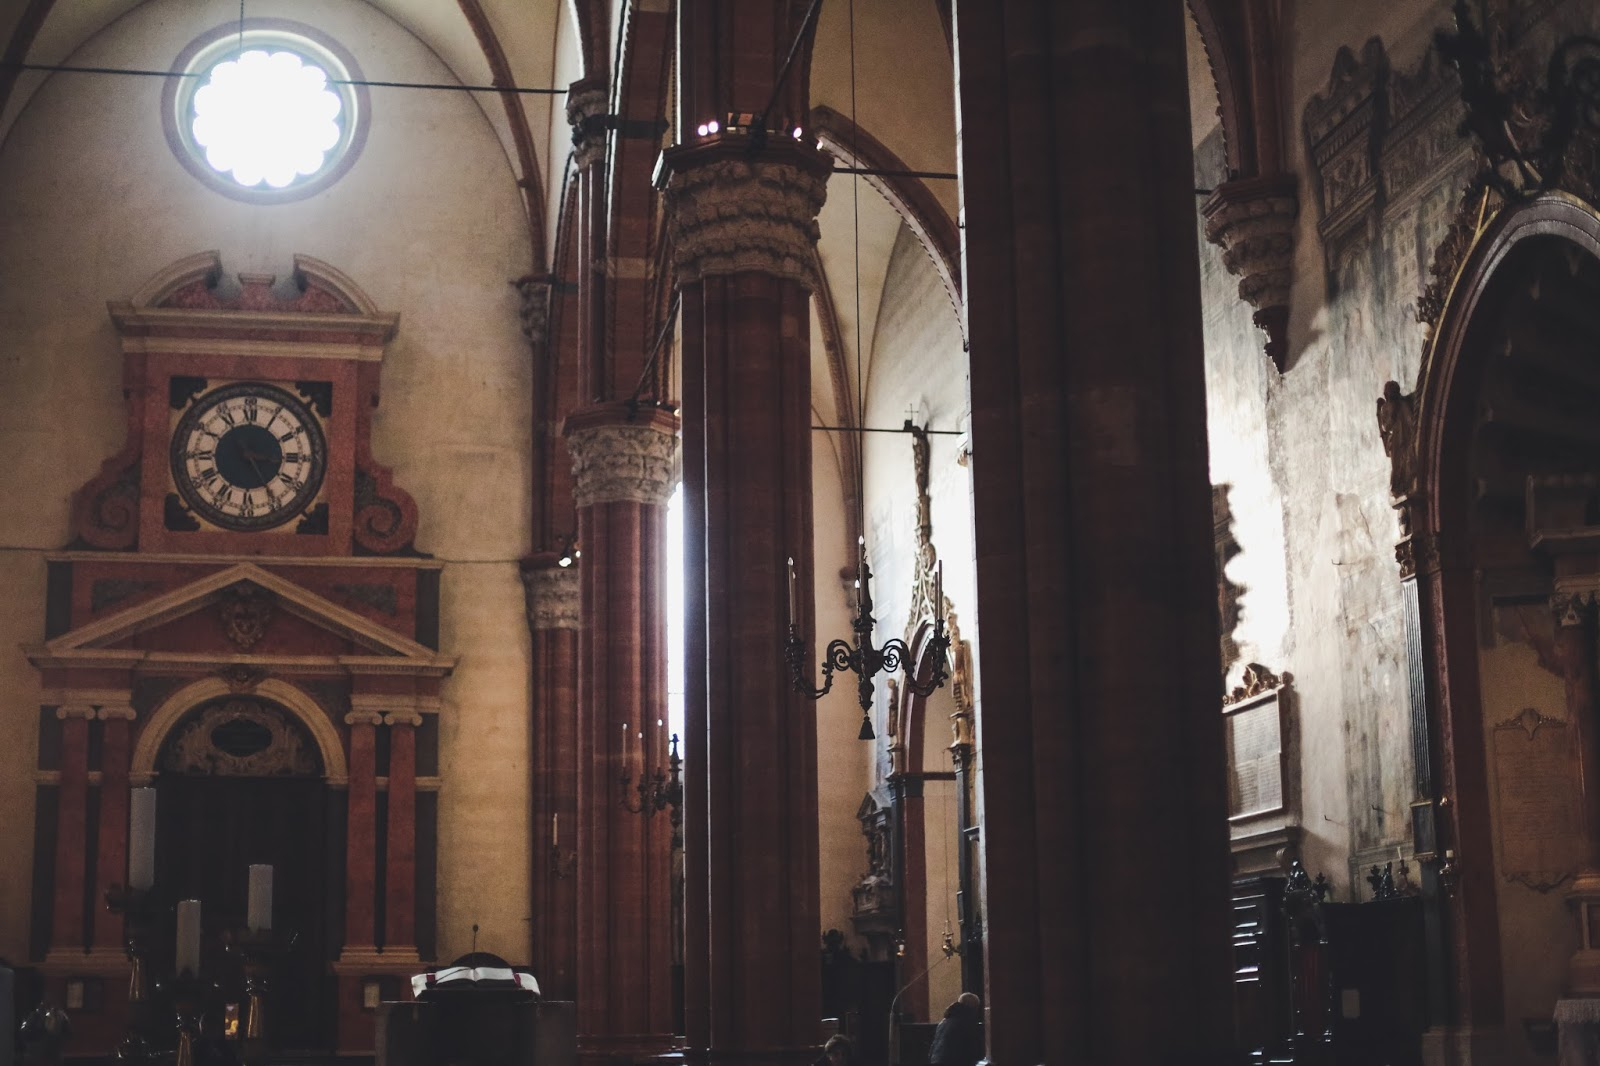 Duomo di Verona city guide